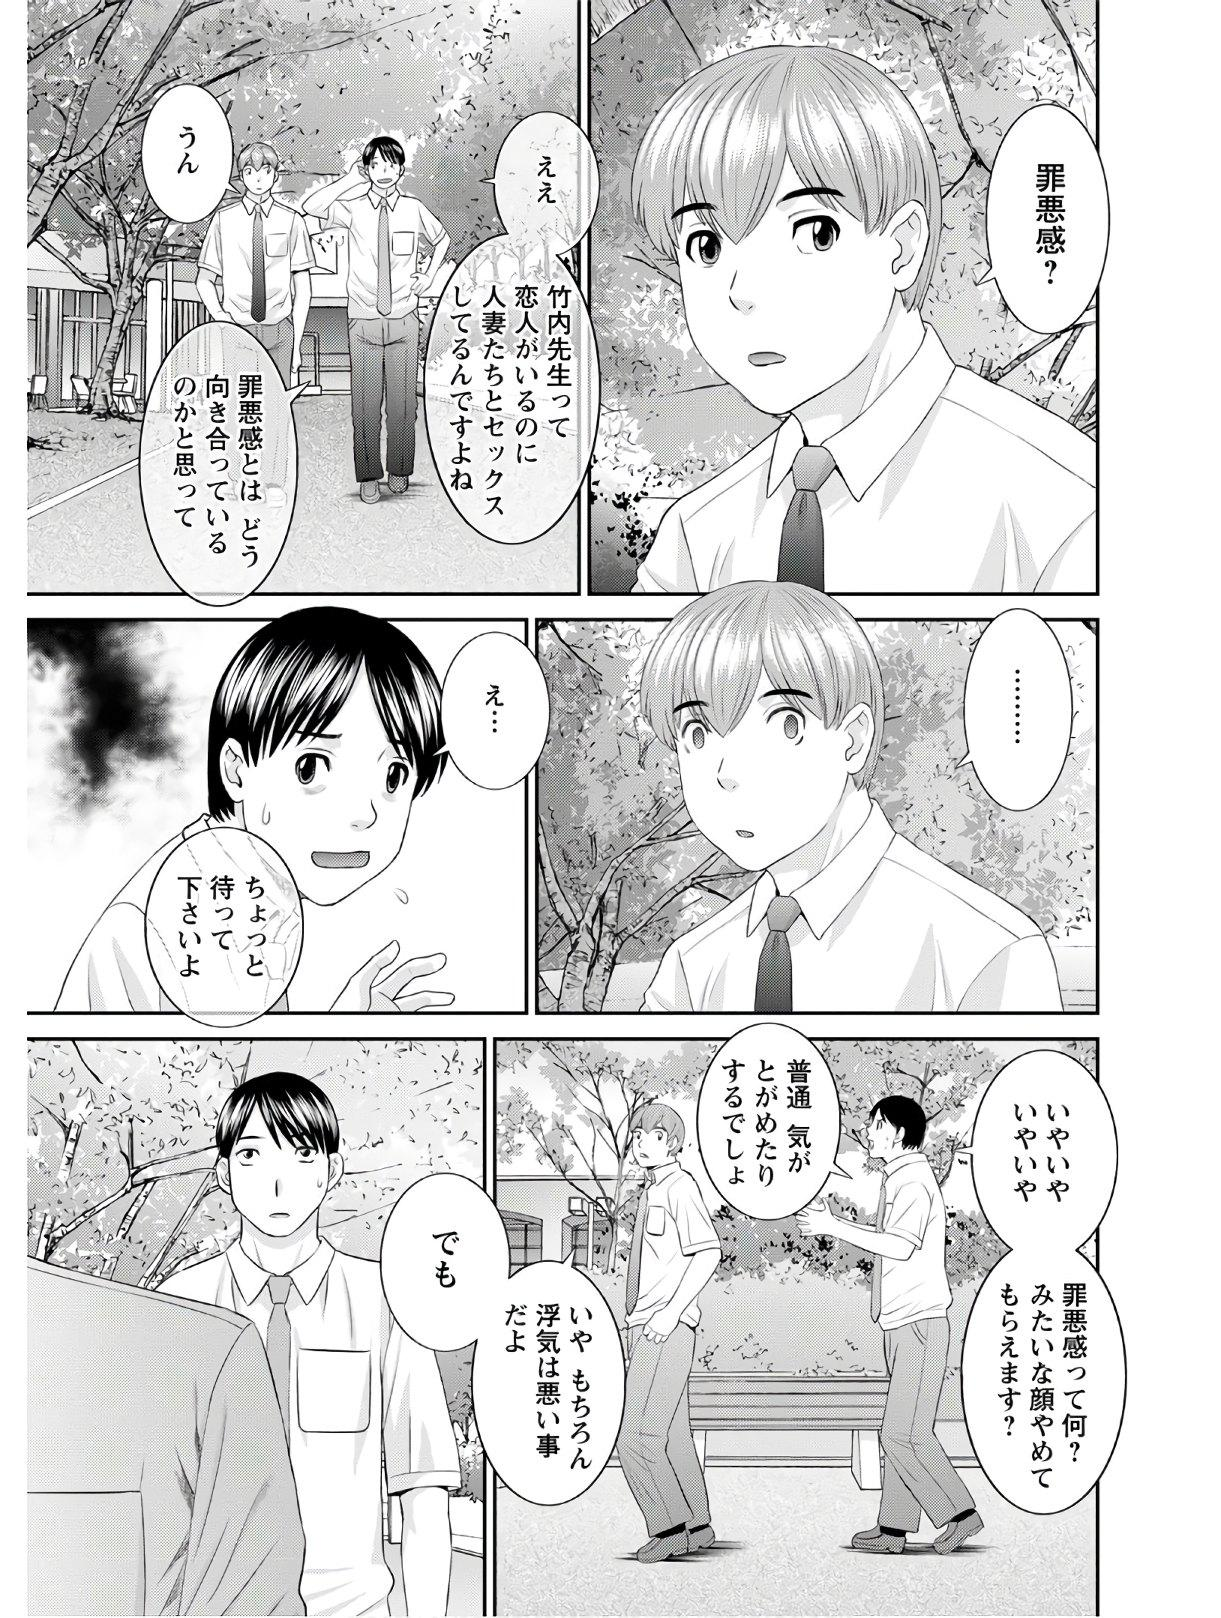 [Kawamori Misaki] Kaikan Hitotsuma Gakuen Ch. 1-6, 8-20 [Digital] 311